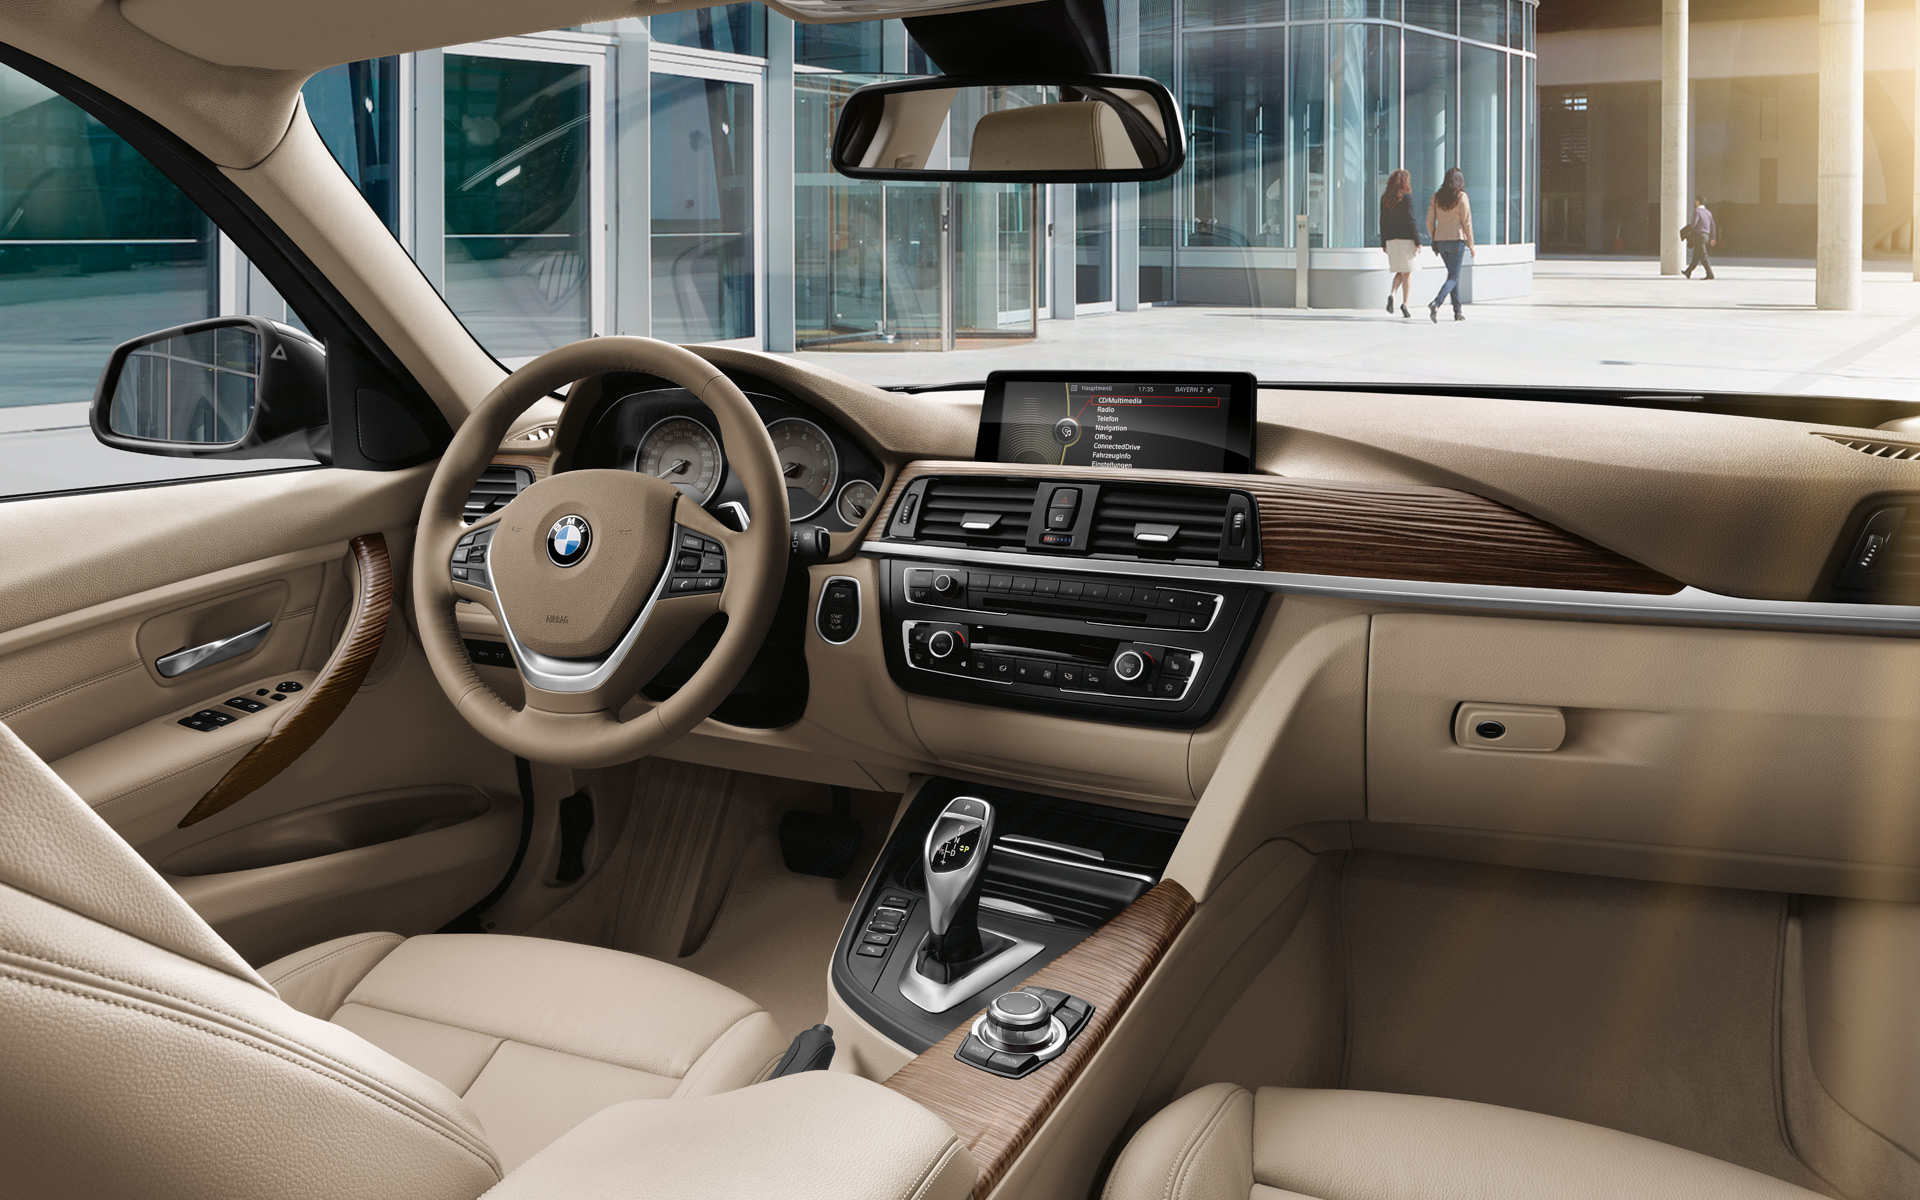 BMW 3 Series F30 Interior